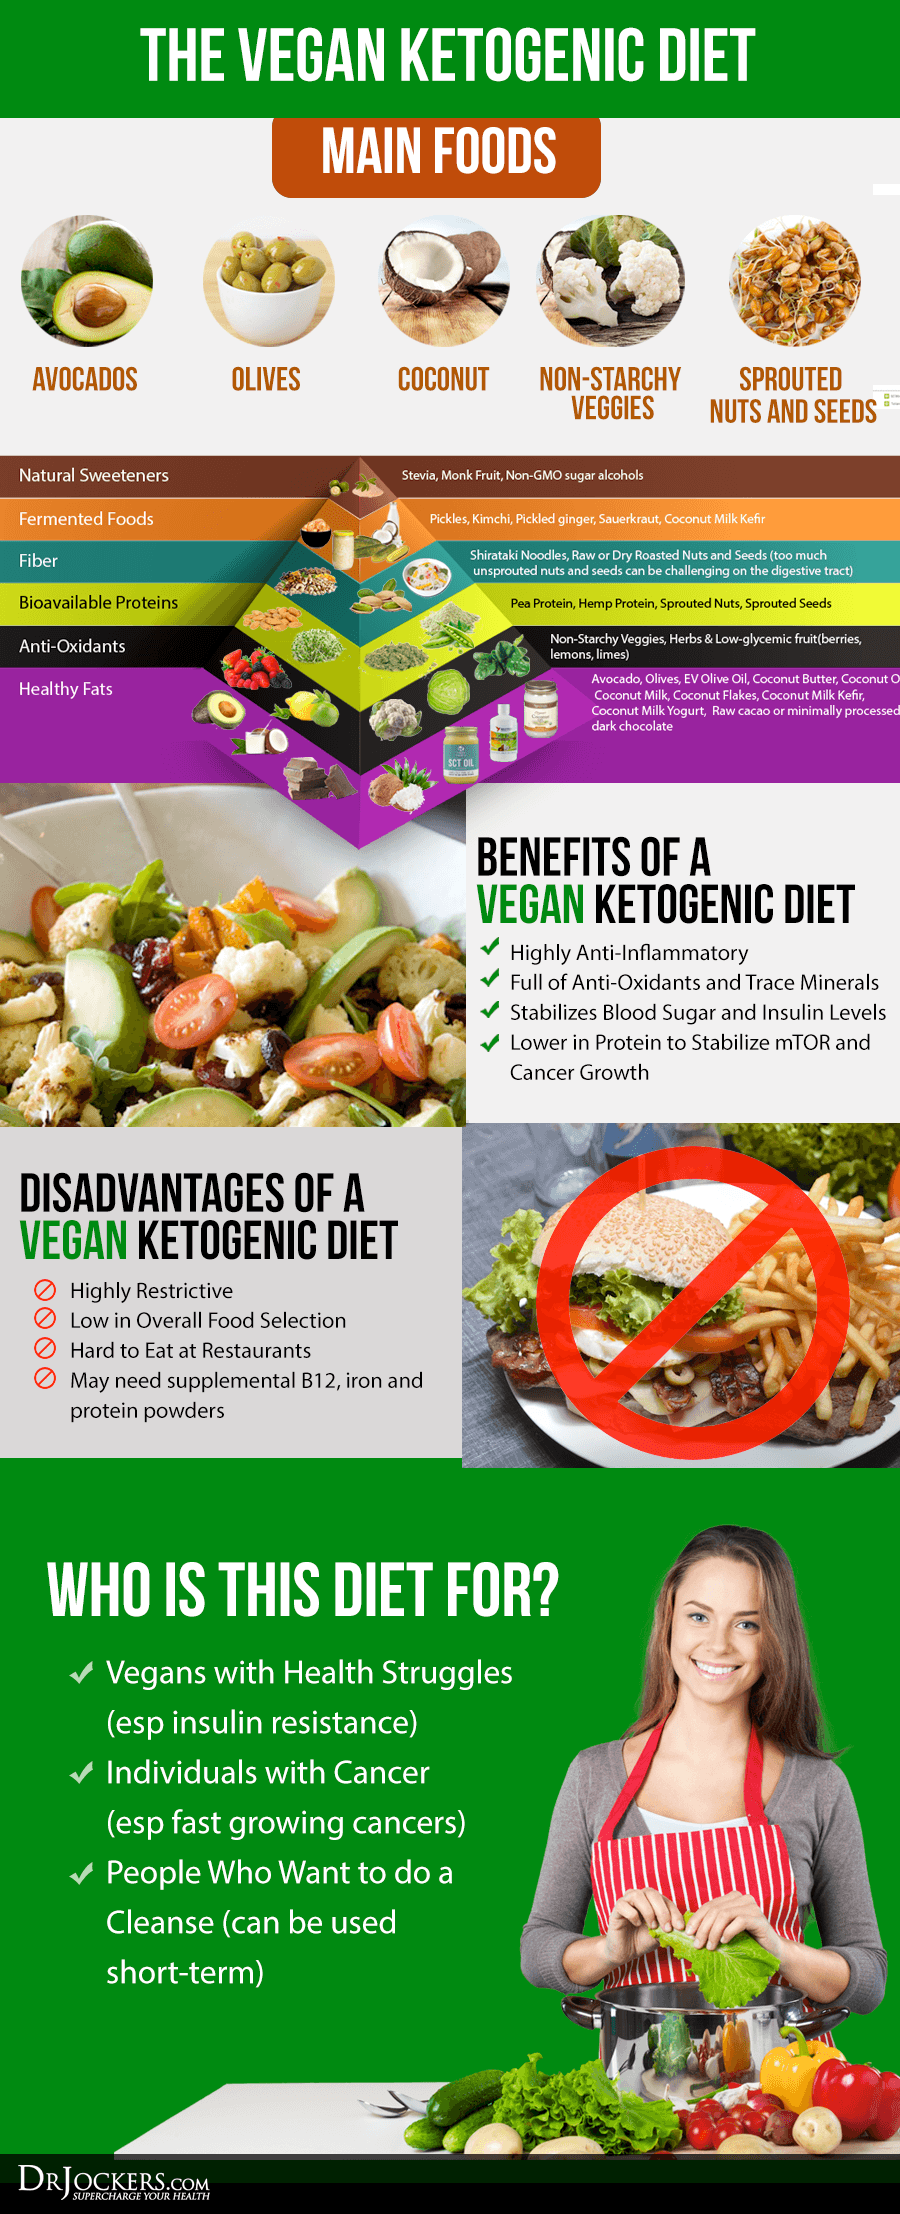 How To Follow A Vegan Ketogenic Diet Vegan keto diet